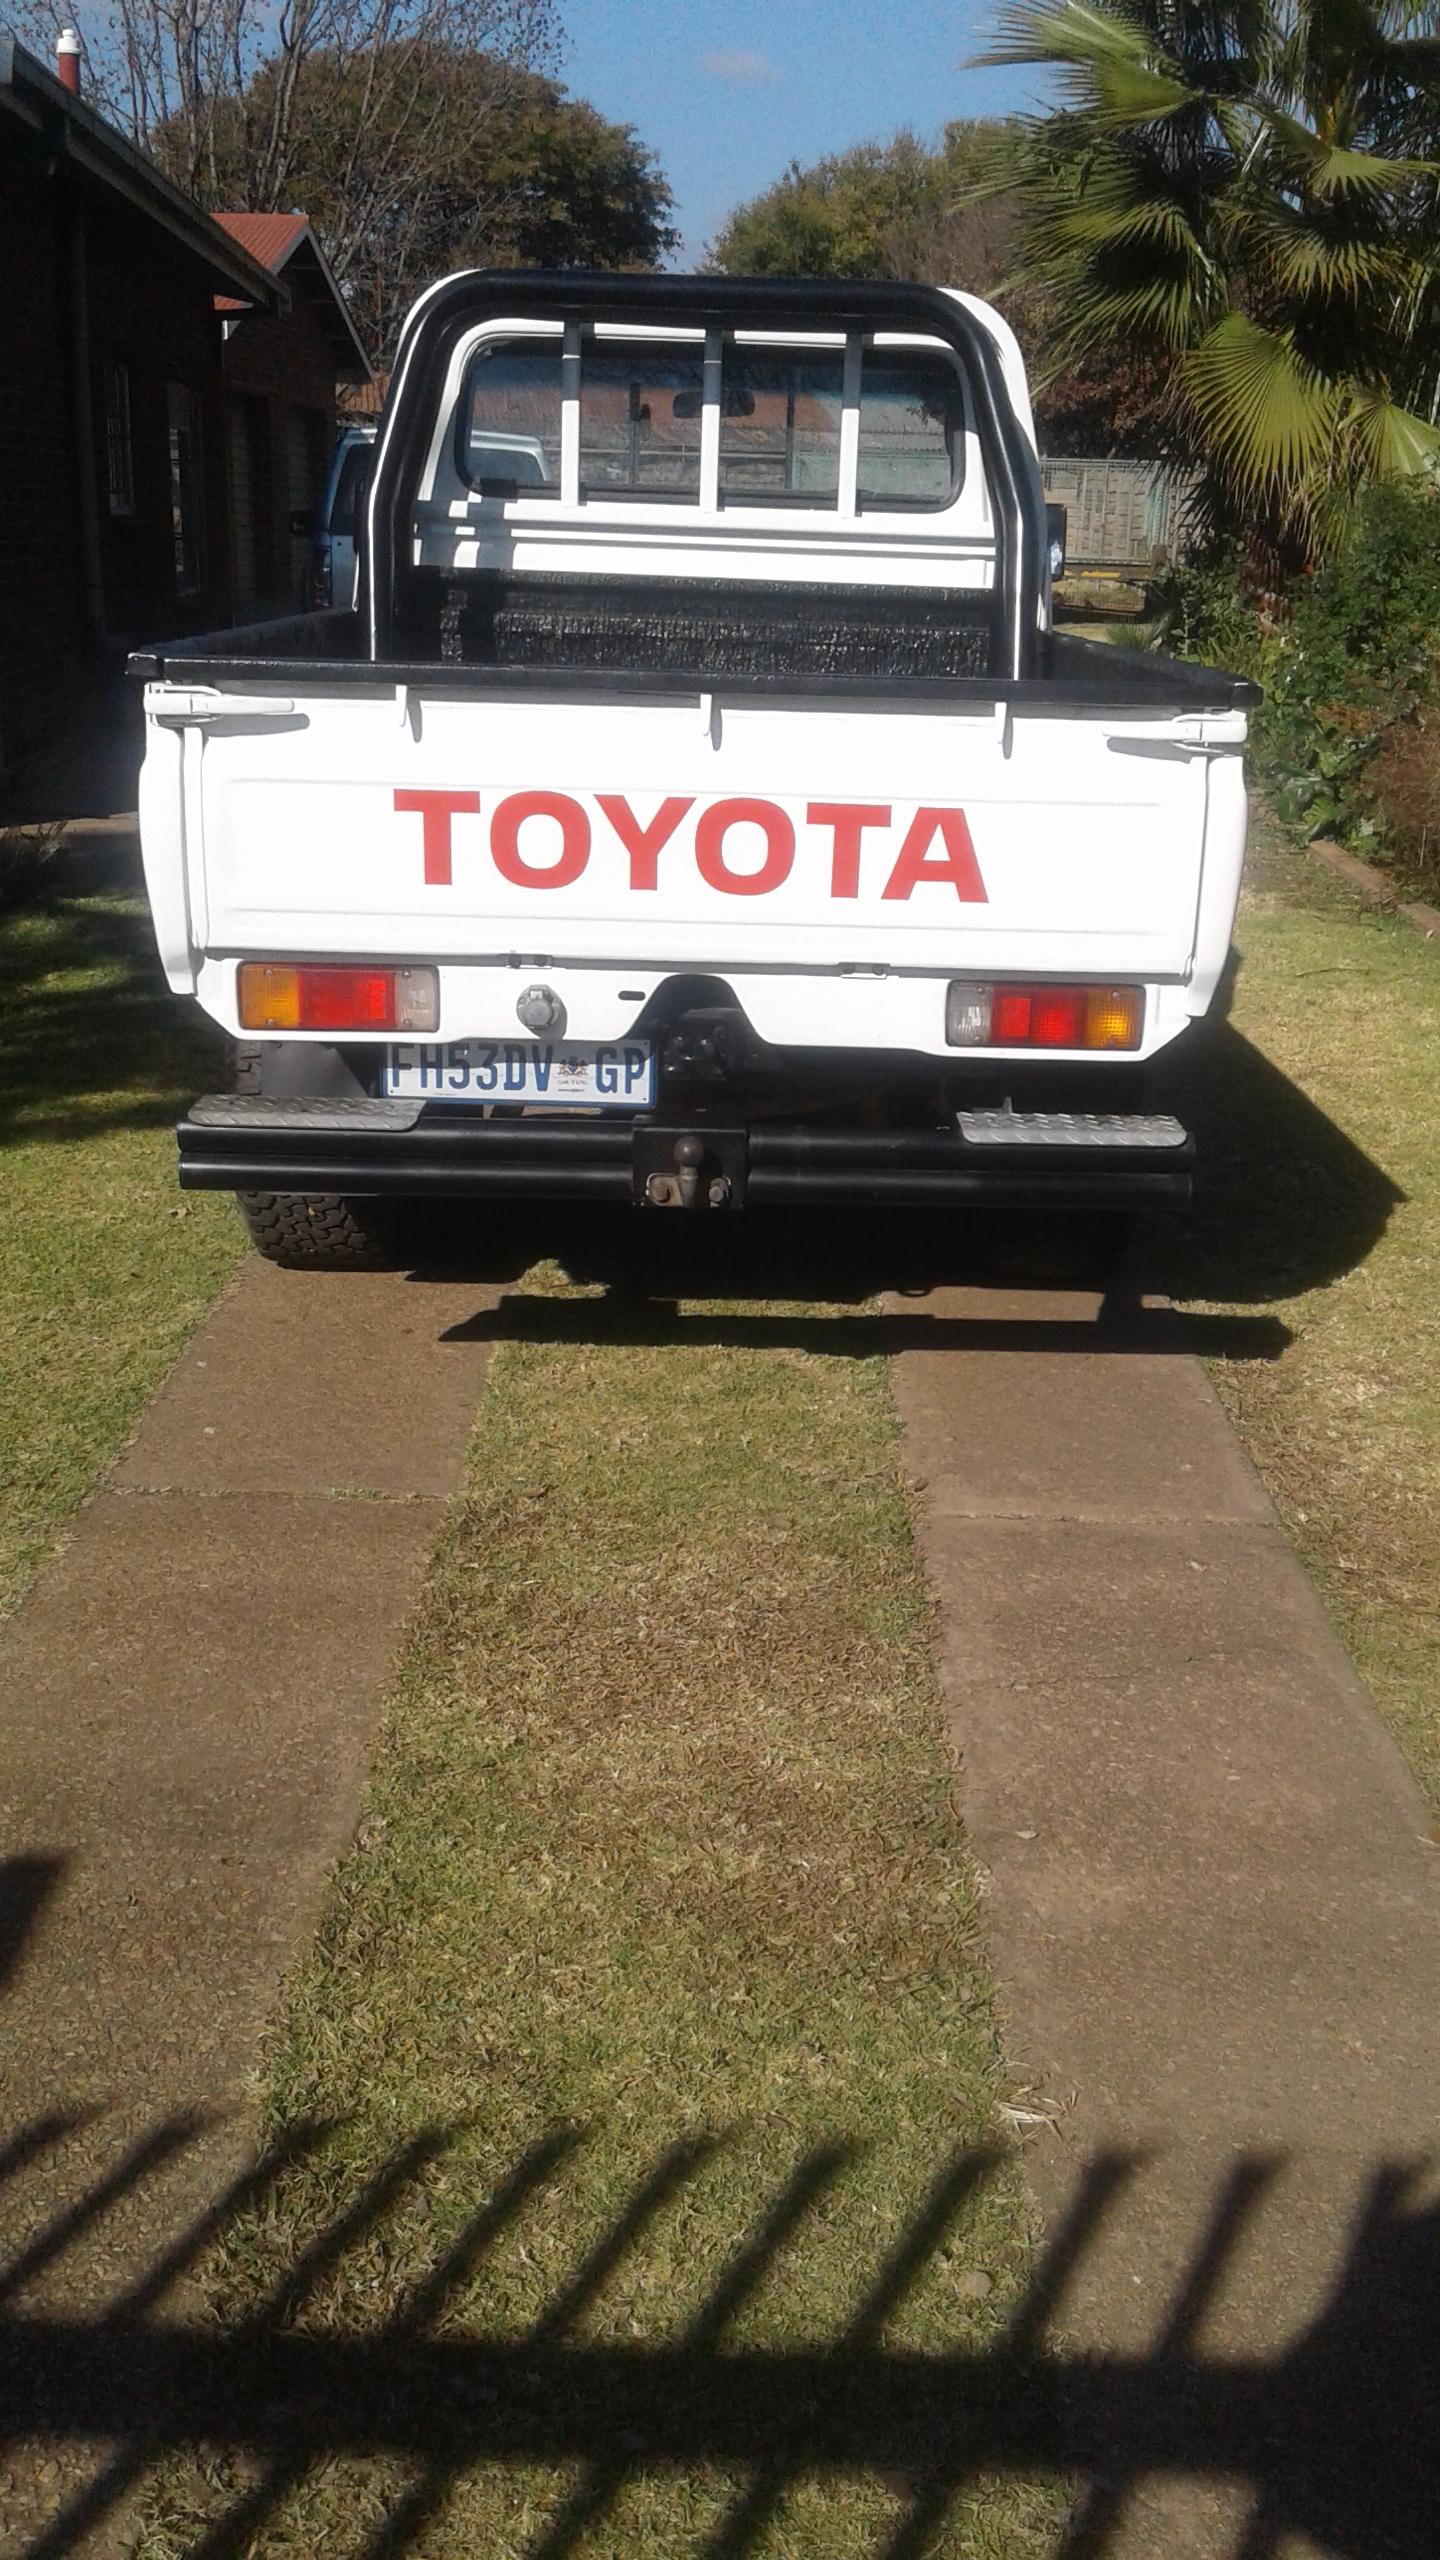 1988 Toyota Land Cruiser 70 series 4,5